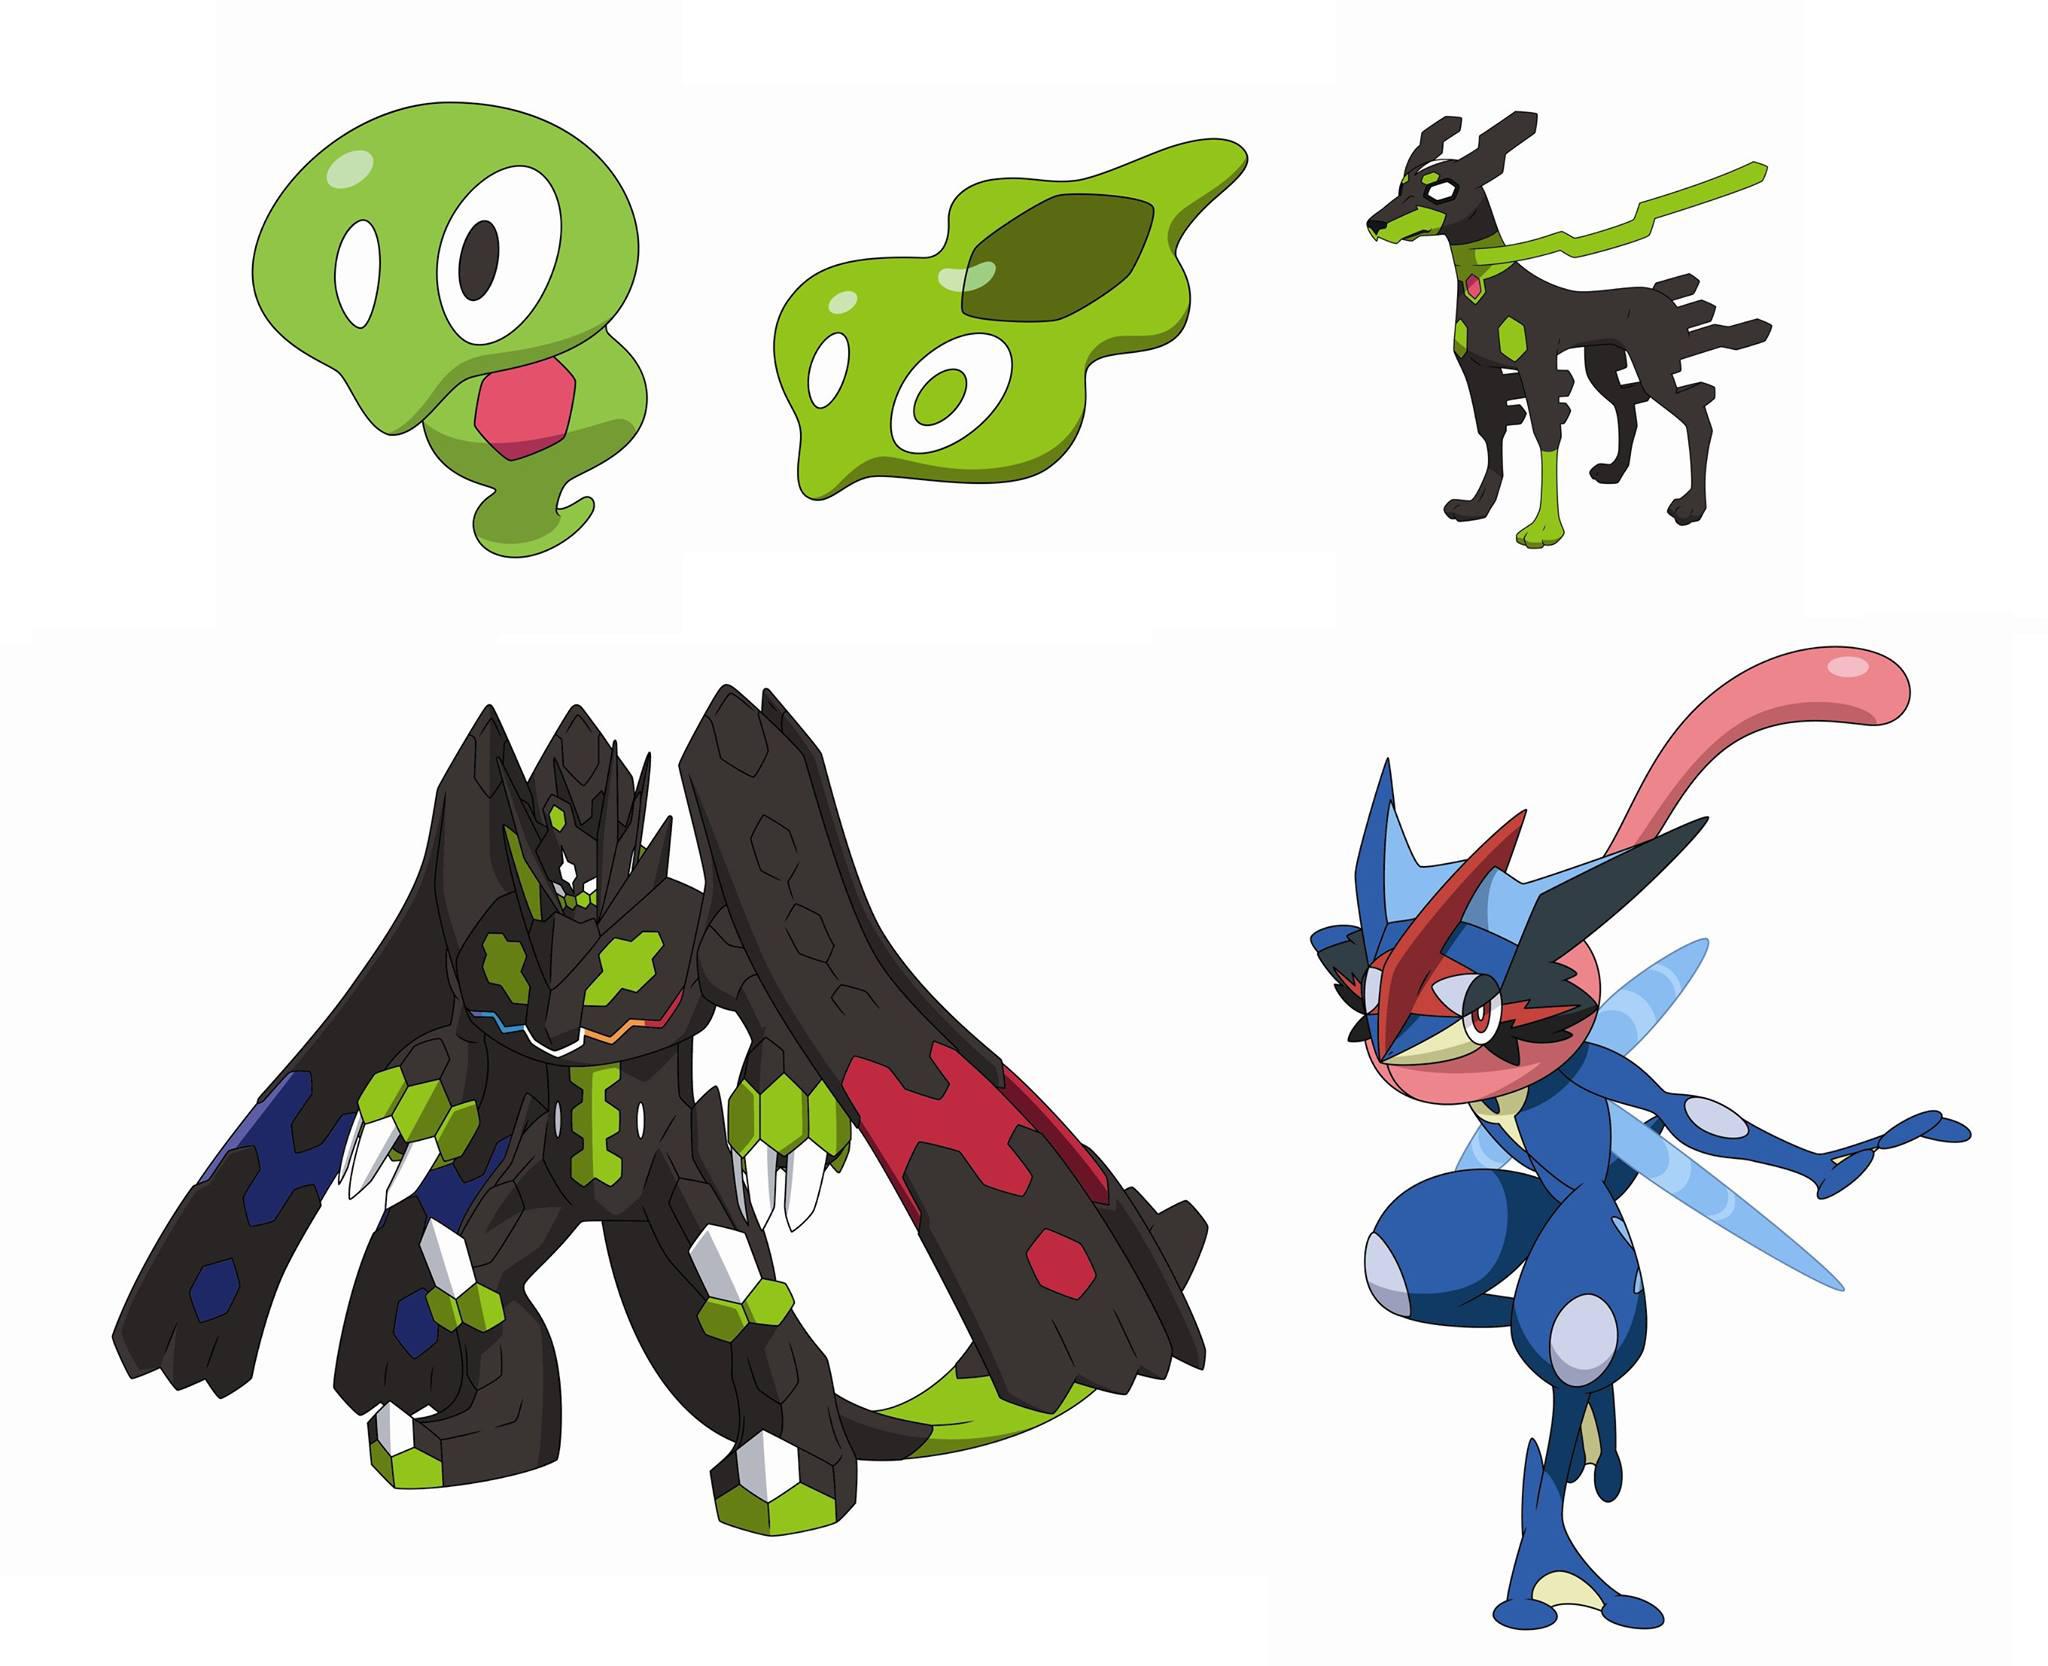 pokemon-zygarde-complete-forme-ash-greninja